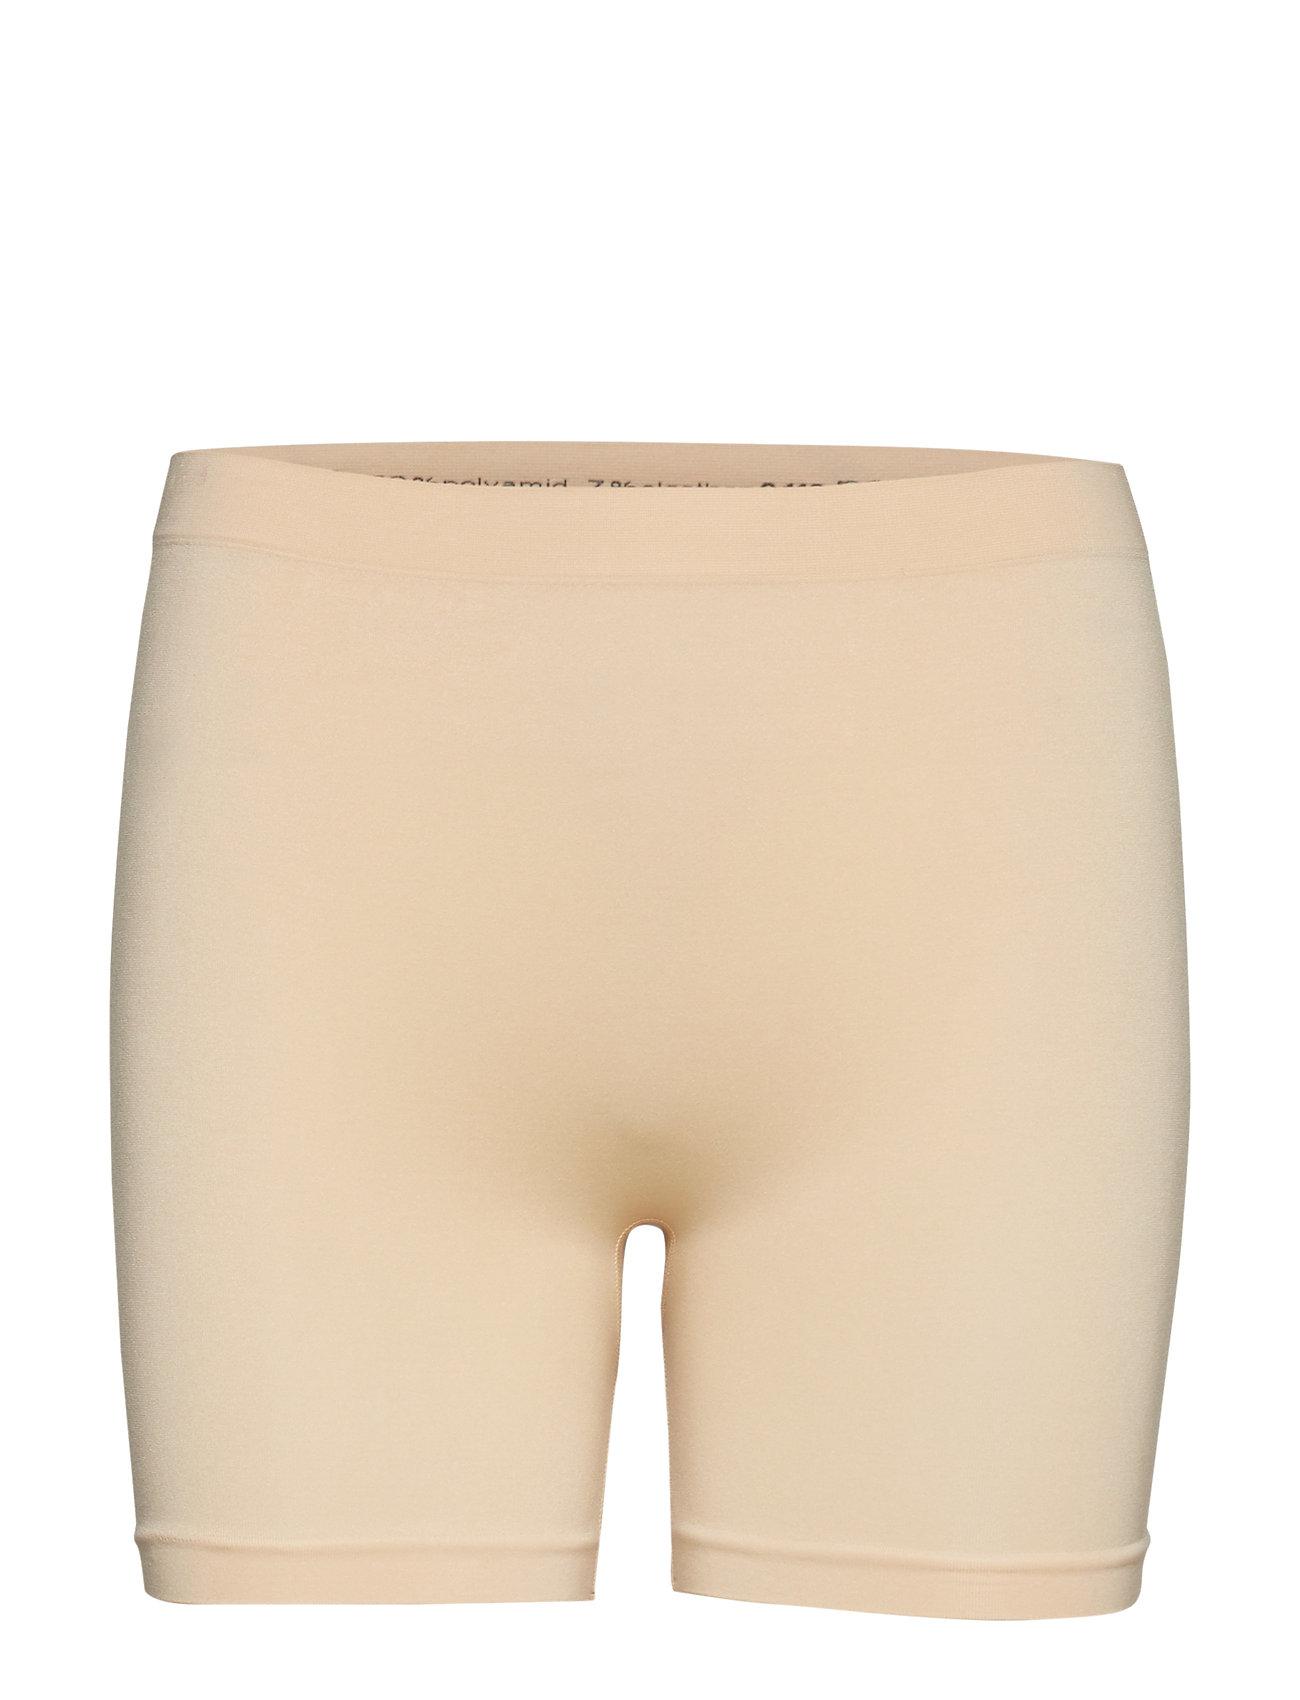 Missya Lucia shorts - NUDE